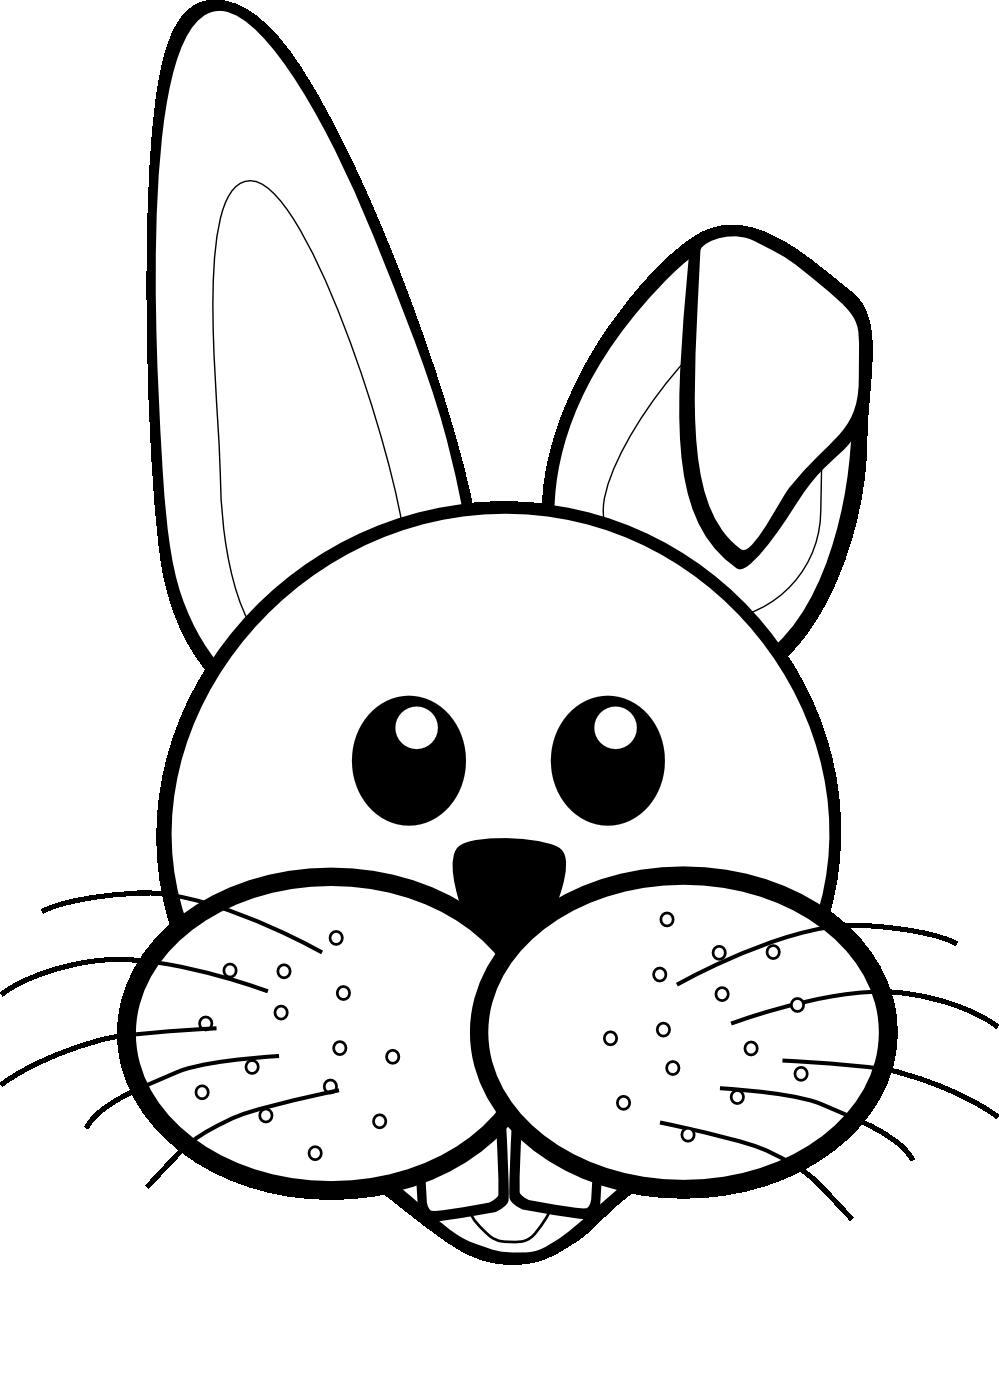 White Rabbit Clip Art - ClipArt Best